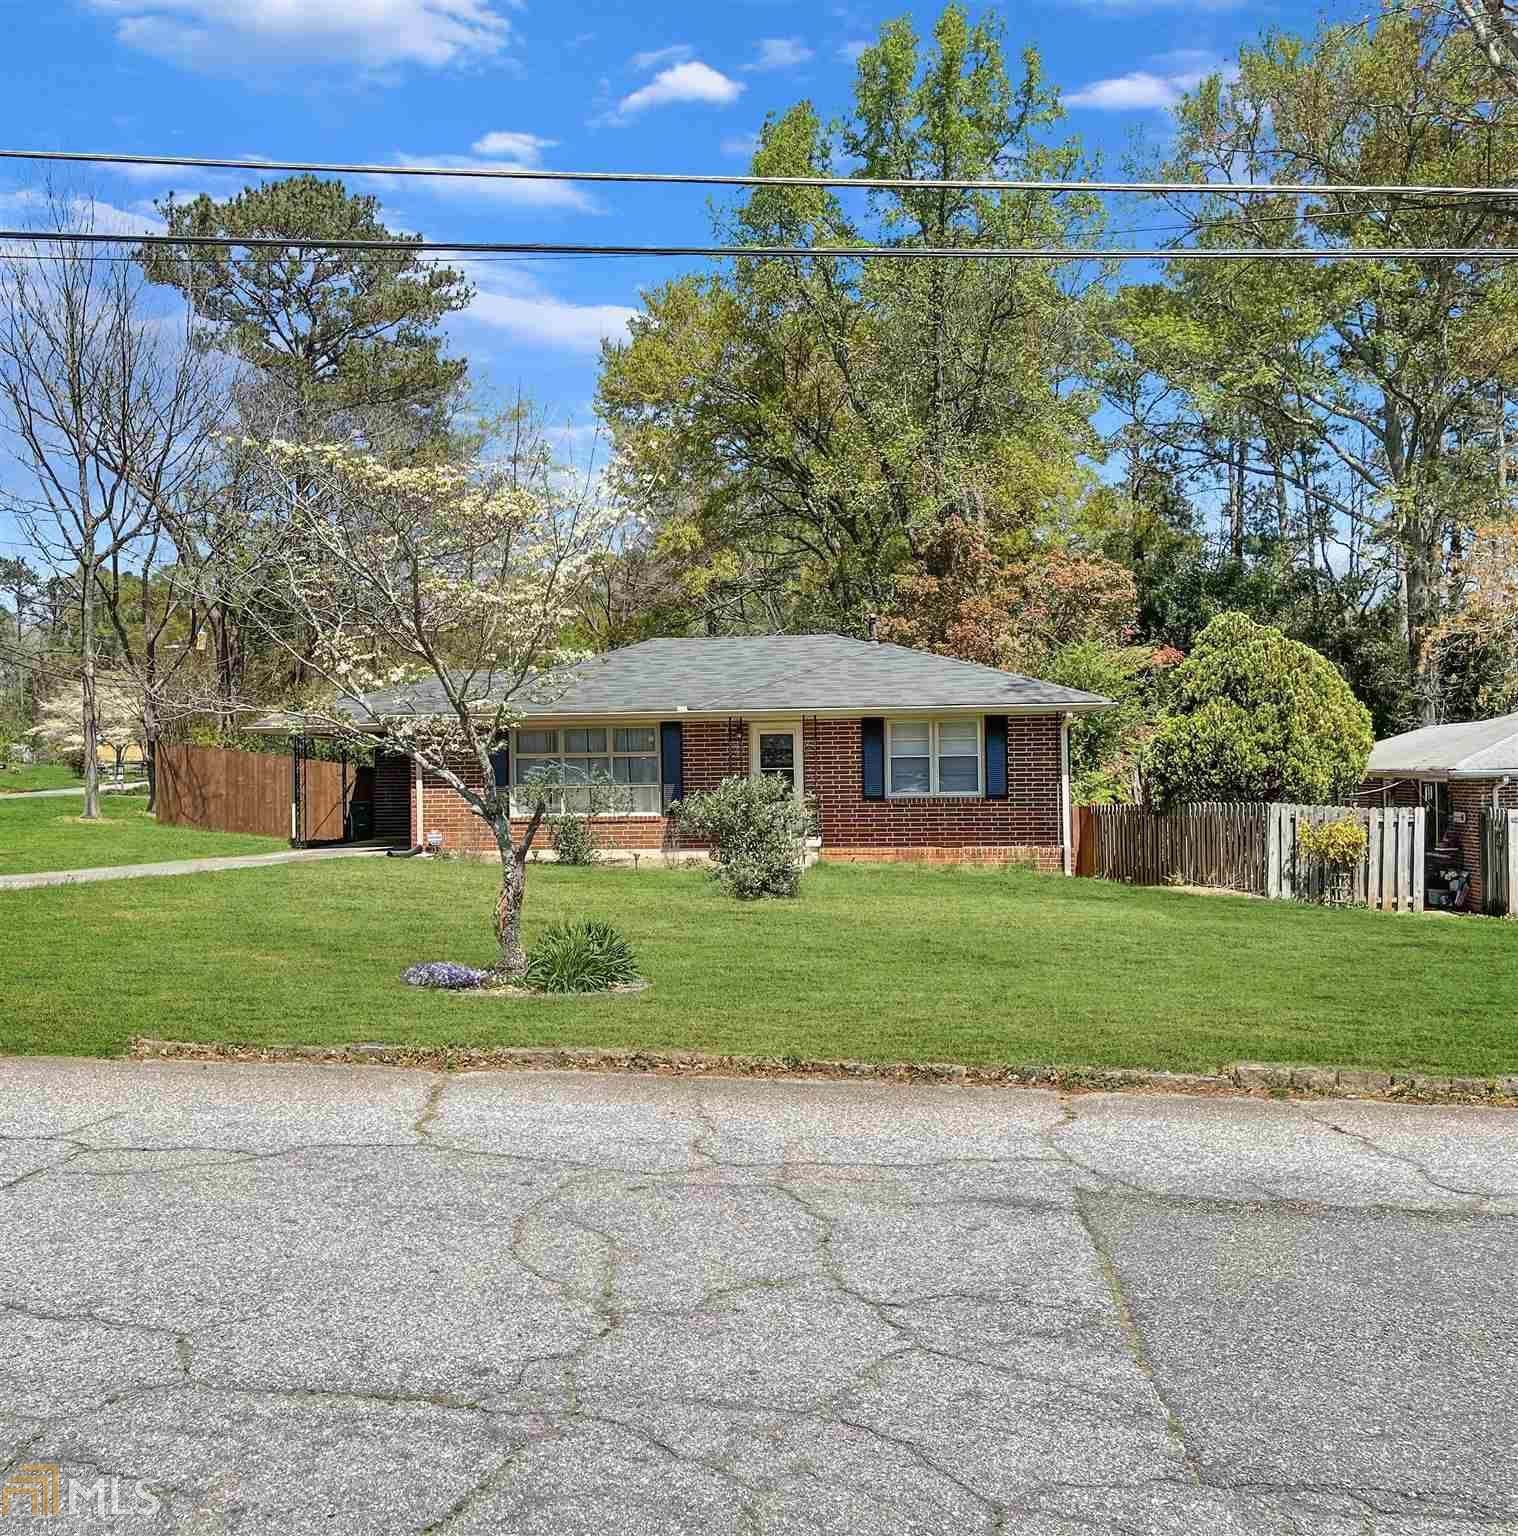 1207 N Valley Brook Rd, Decatur, GA 30033 - #: 8956639